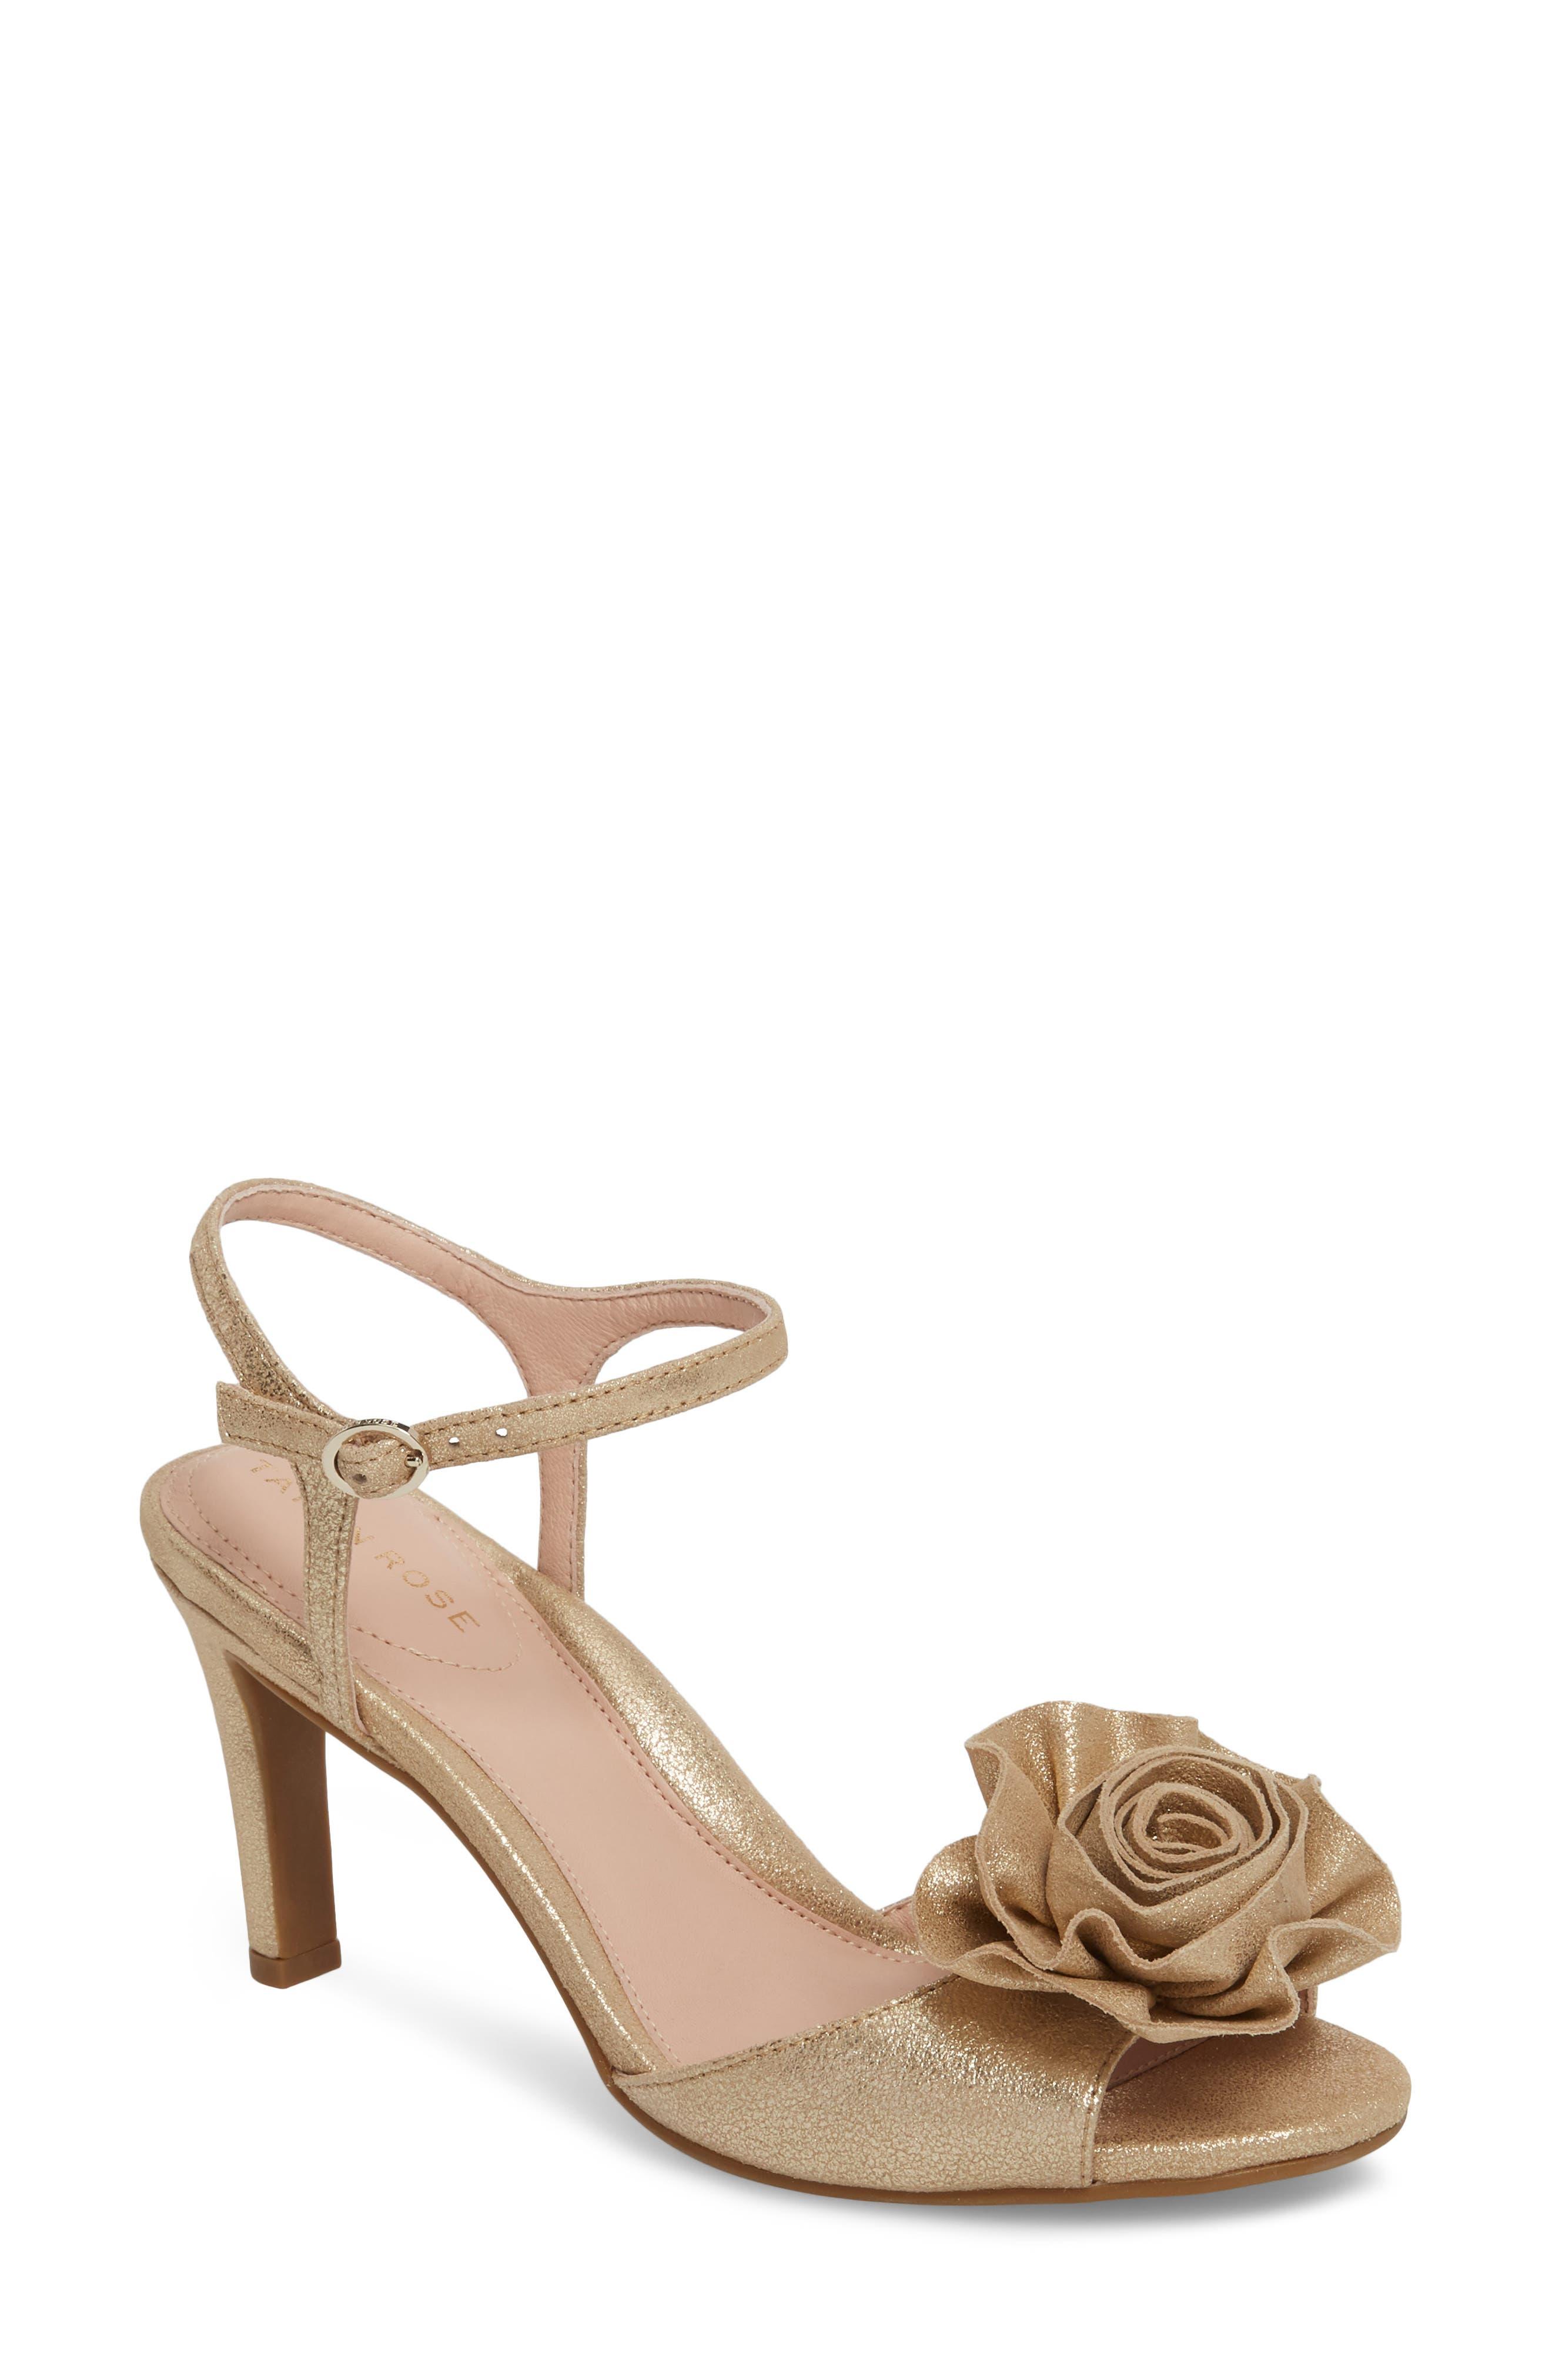 Jacklyn Flower Sandal,                             Main thumbnail 1, color,                             Gold Shimmer Fabric